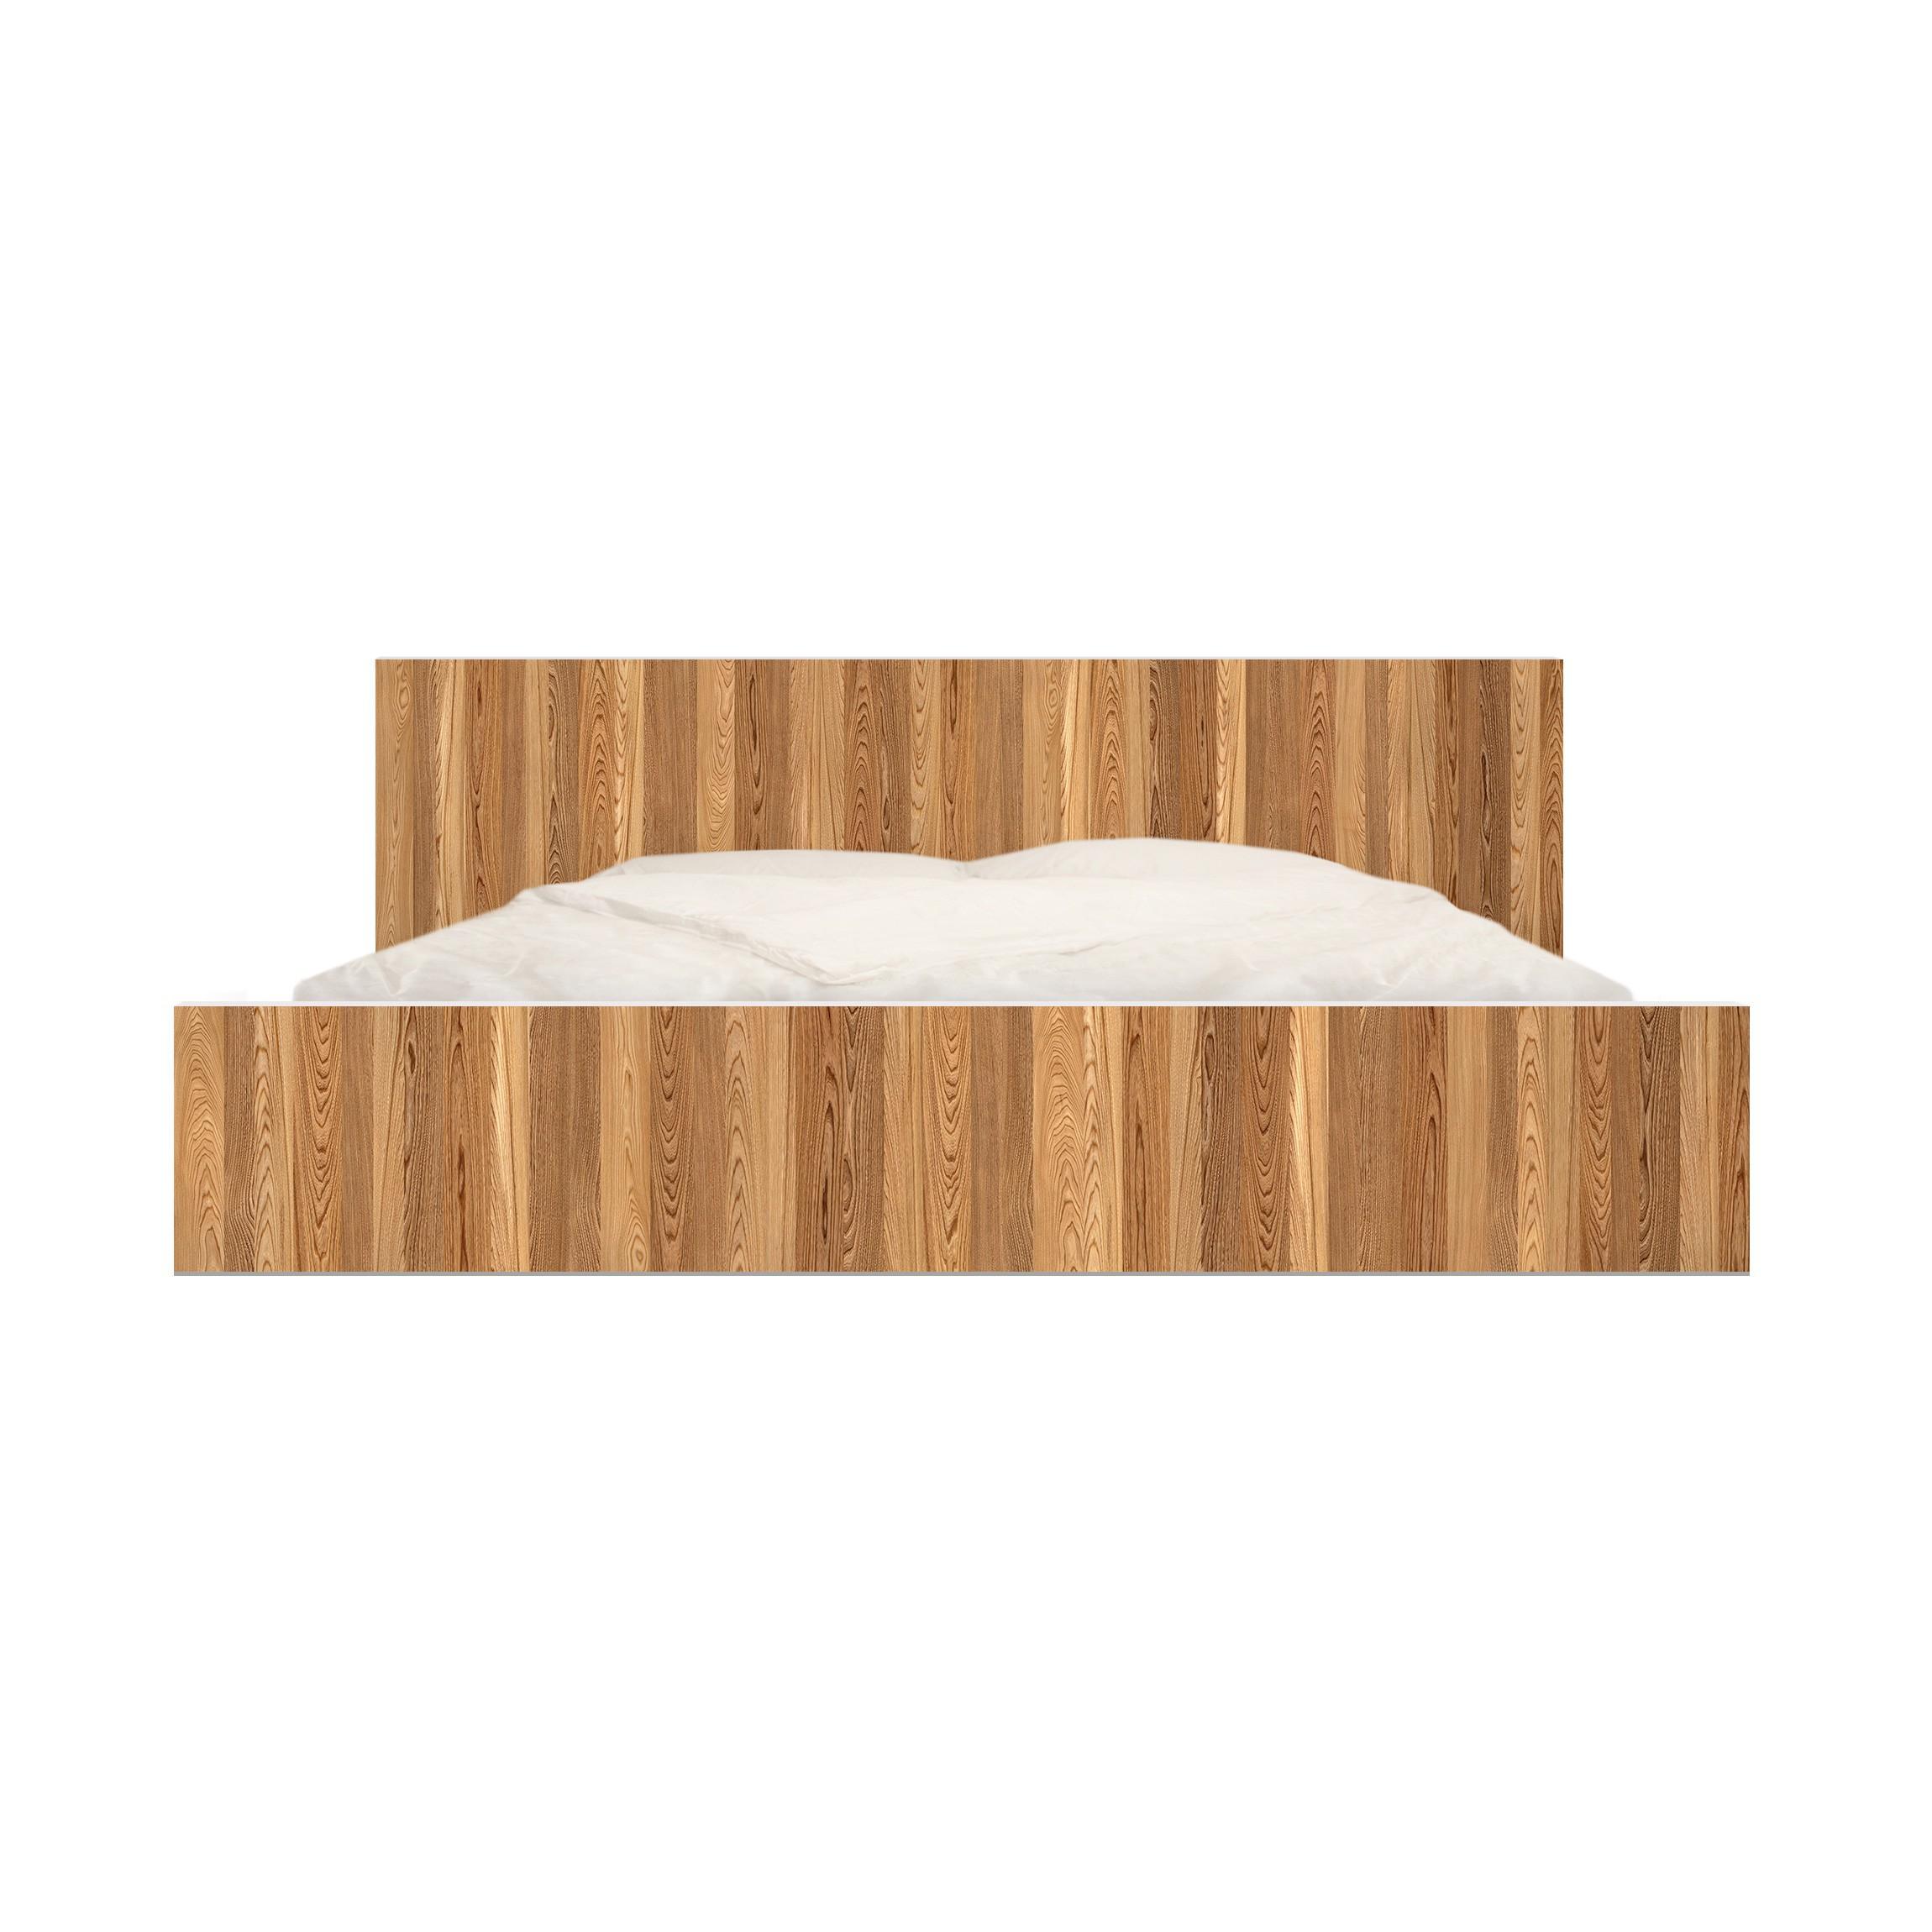 m belfolie f r ikea malm bett niedrig 160x200cm klebefolie sen. Black Bedroom Furniture Sets. Home Design Ideas